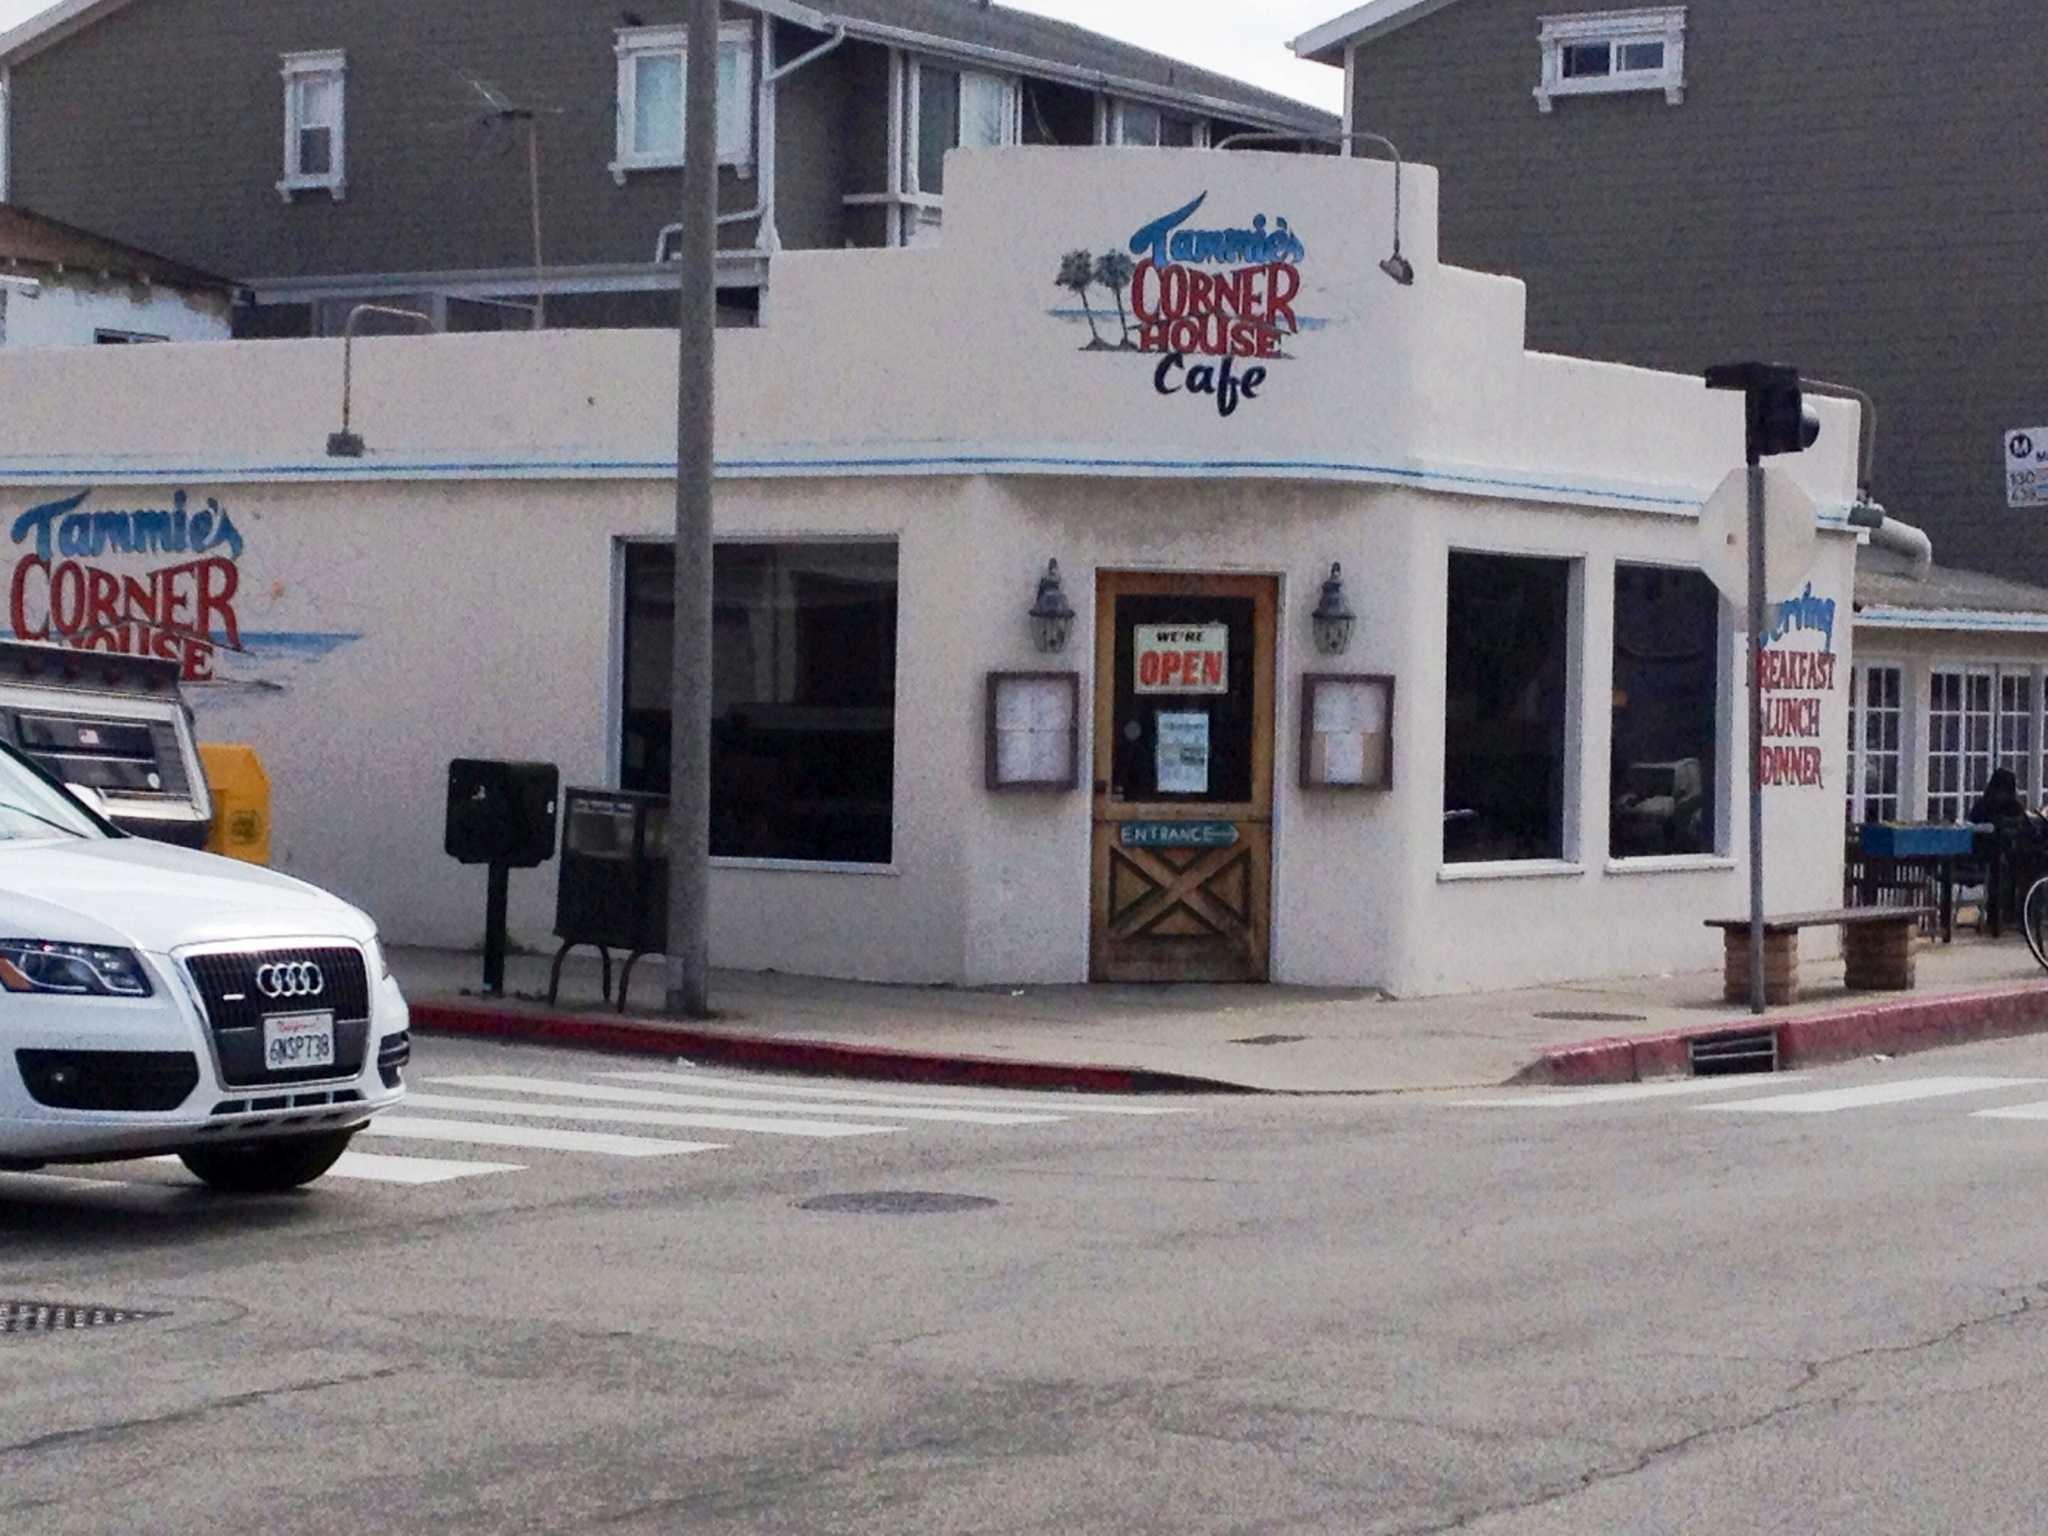 Tammie's Corner House Cafe